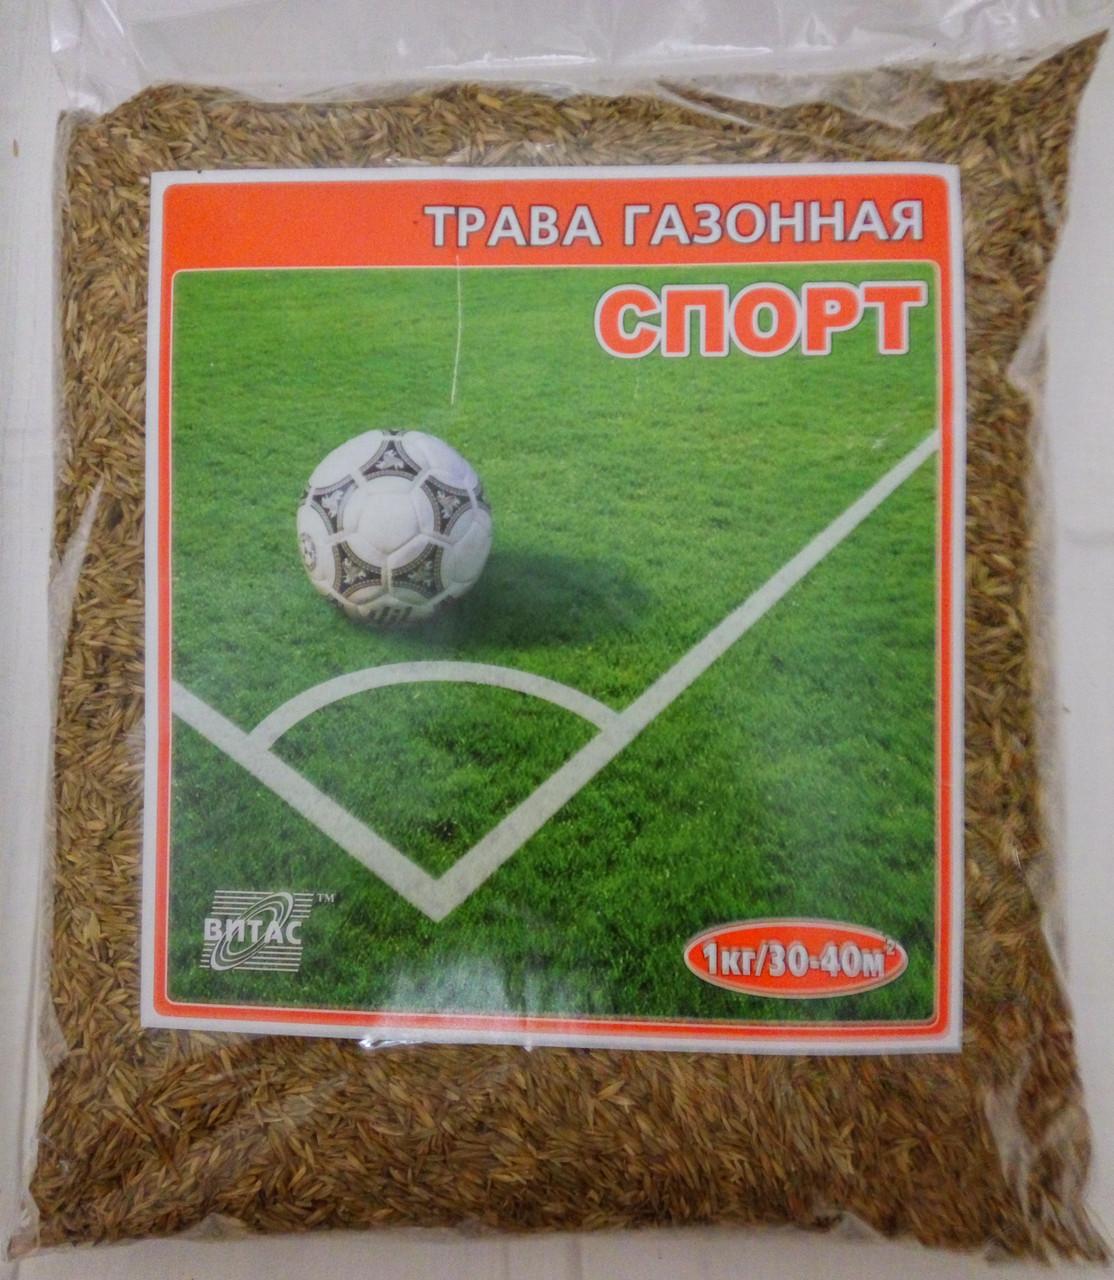 Трава газонная СПОРТ, упаковка 1 кг, ТМ Витас